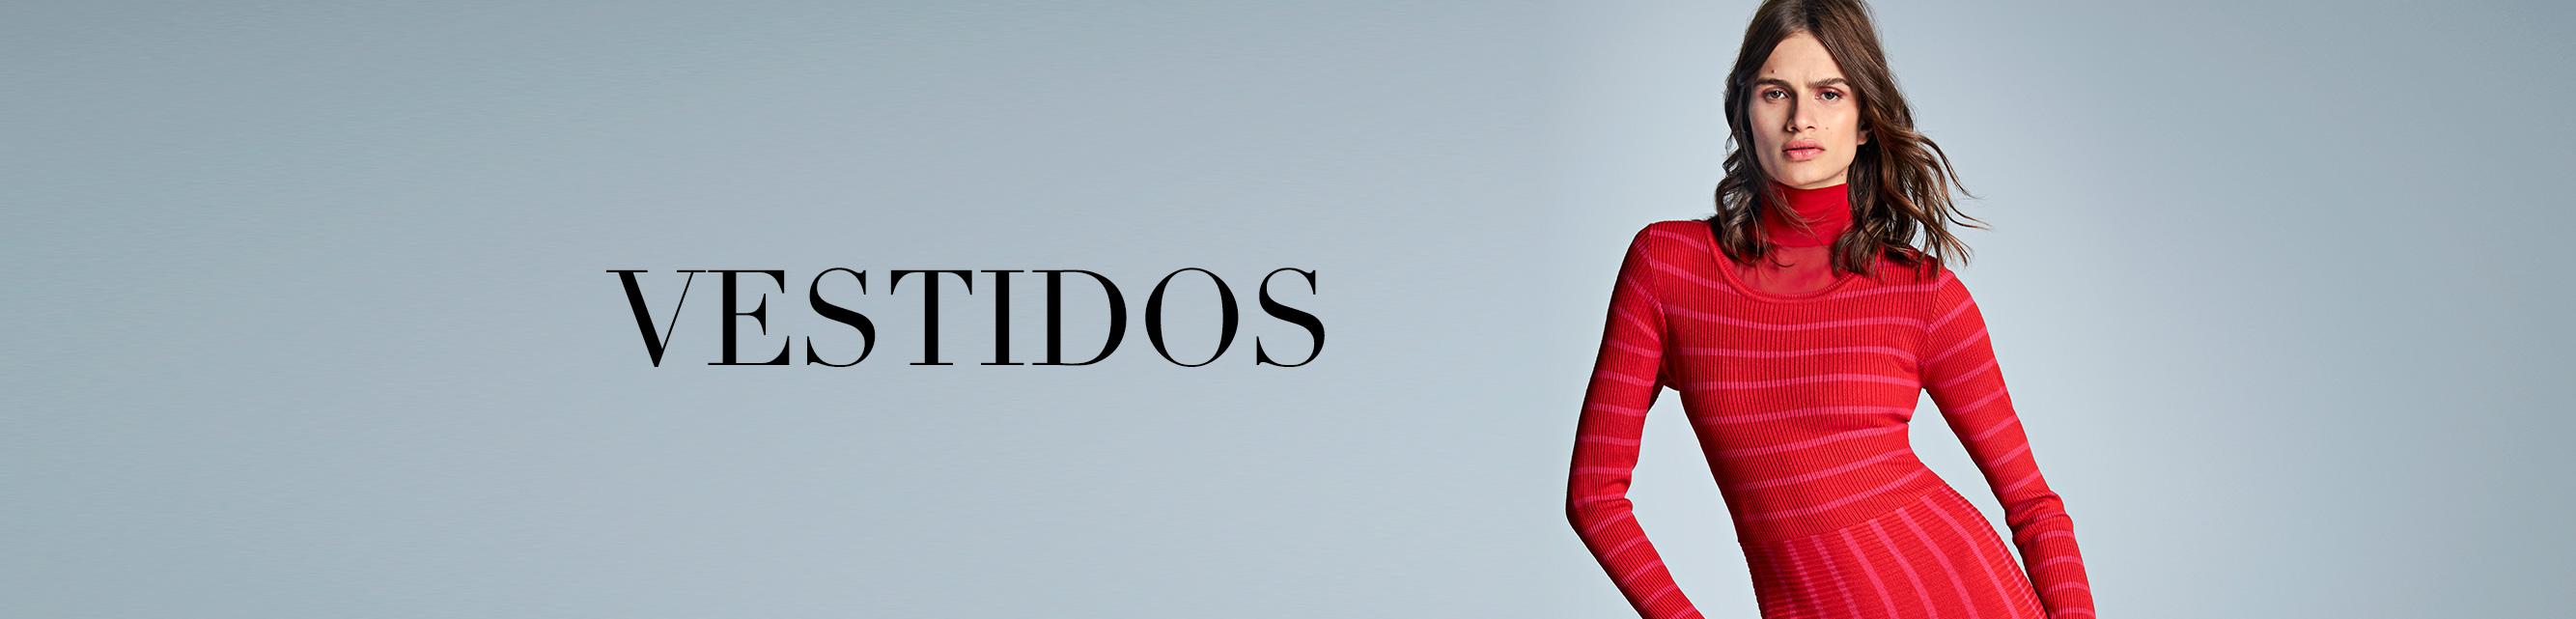 Banner Vestidos